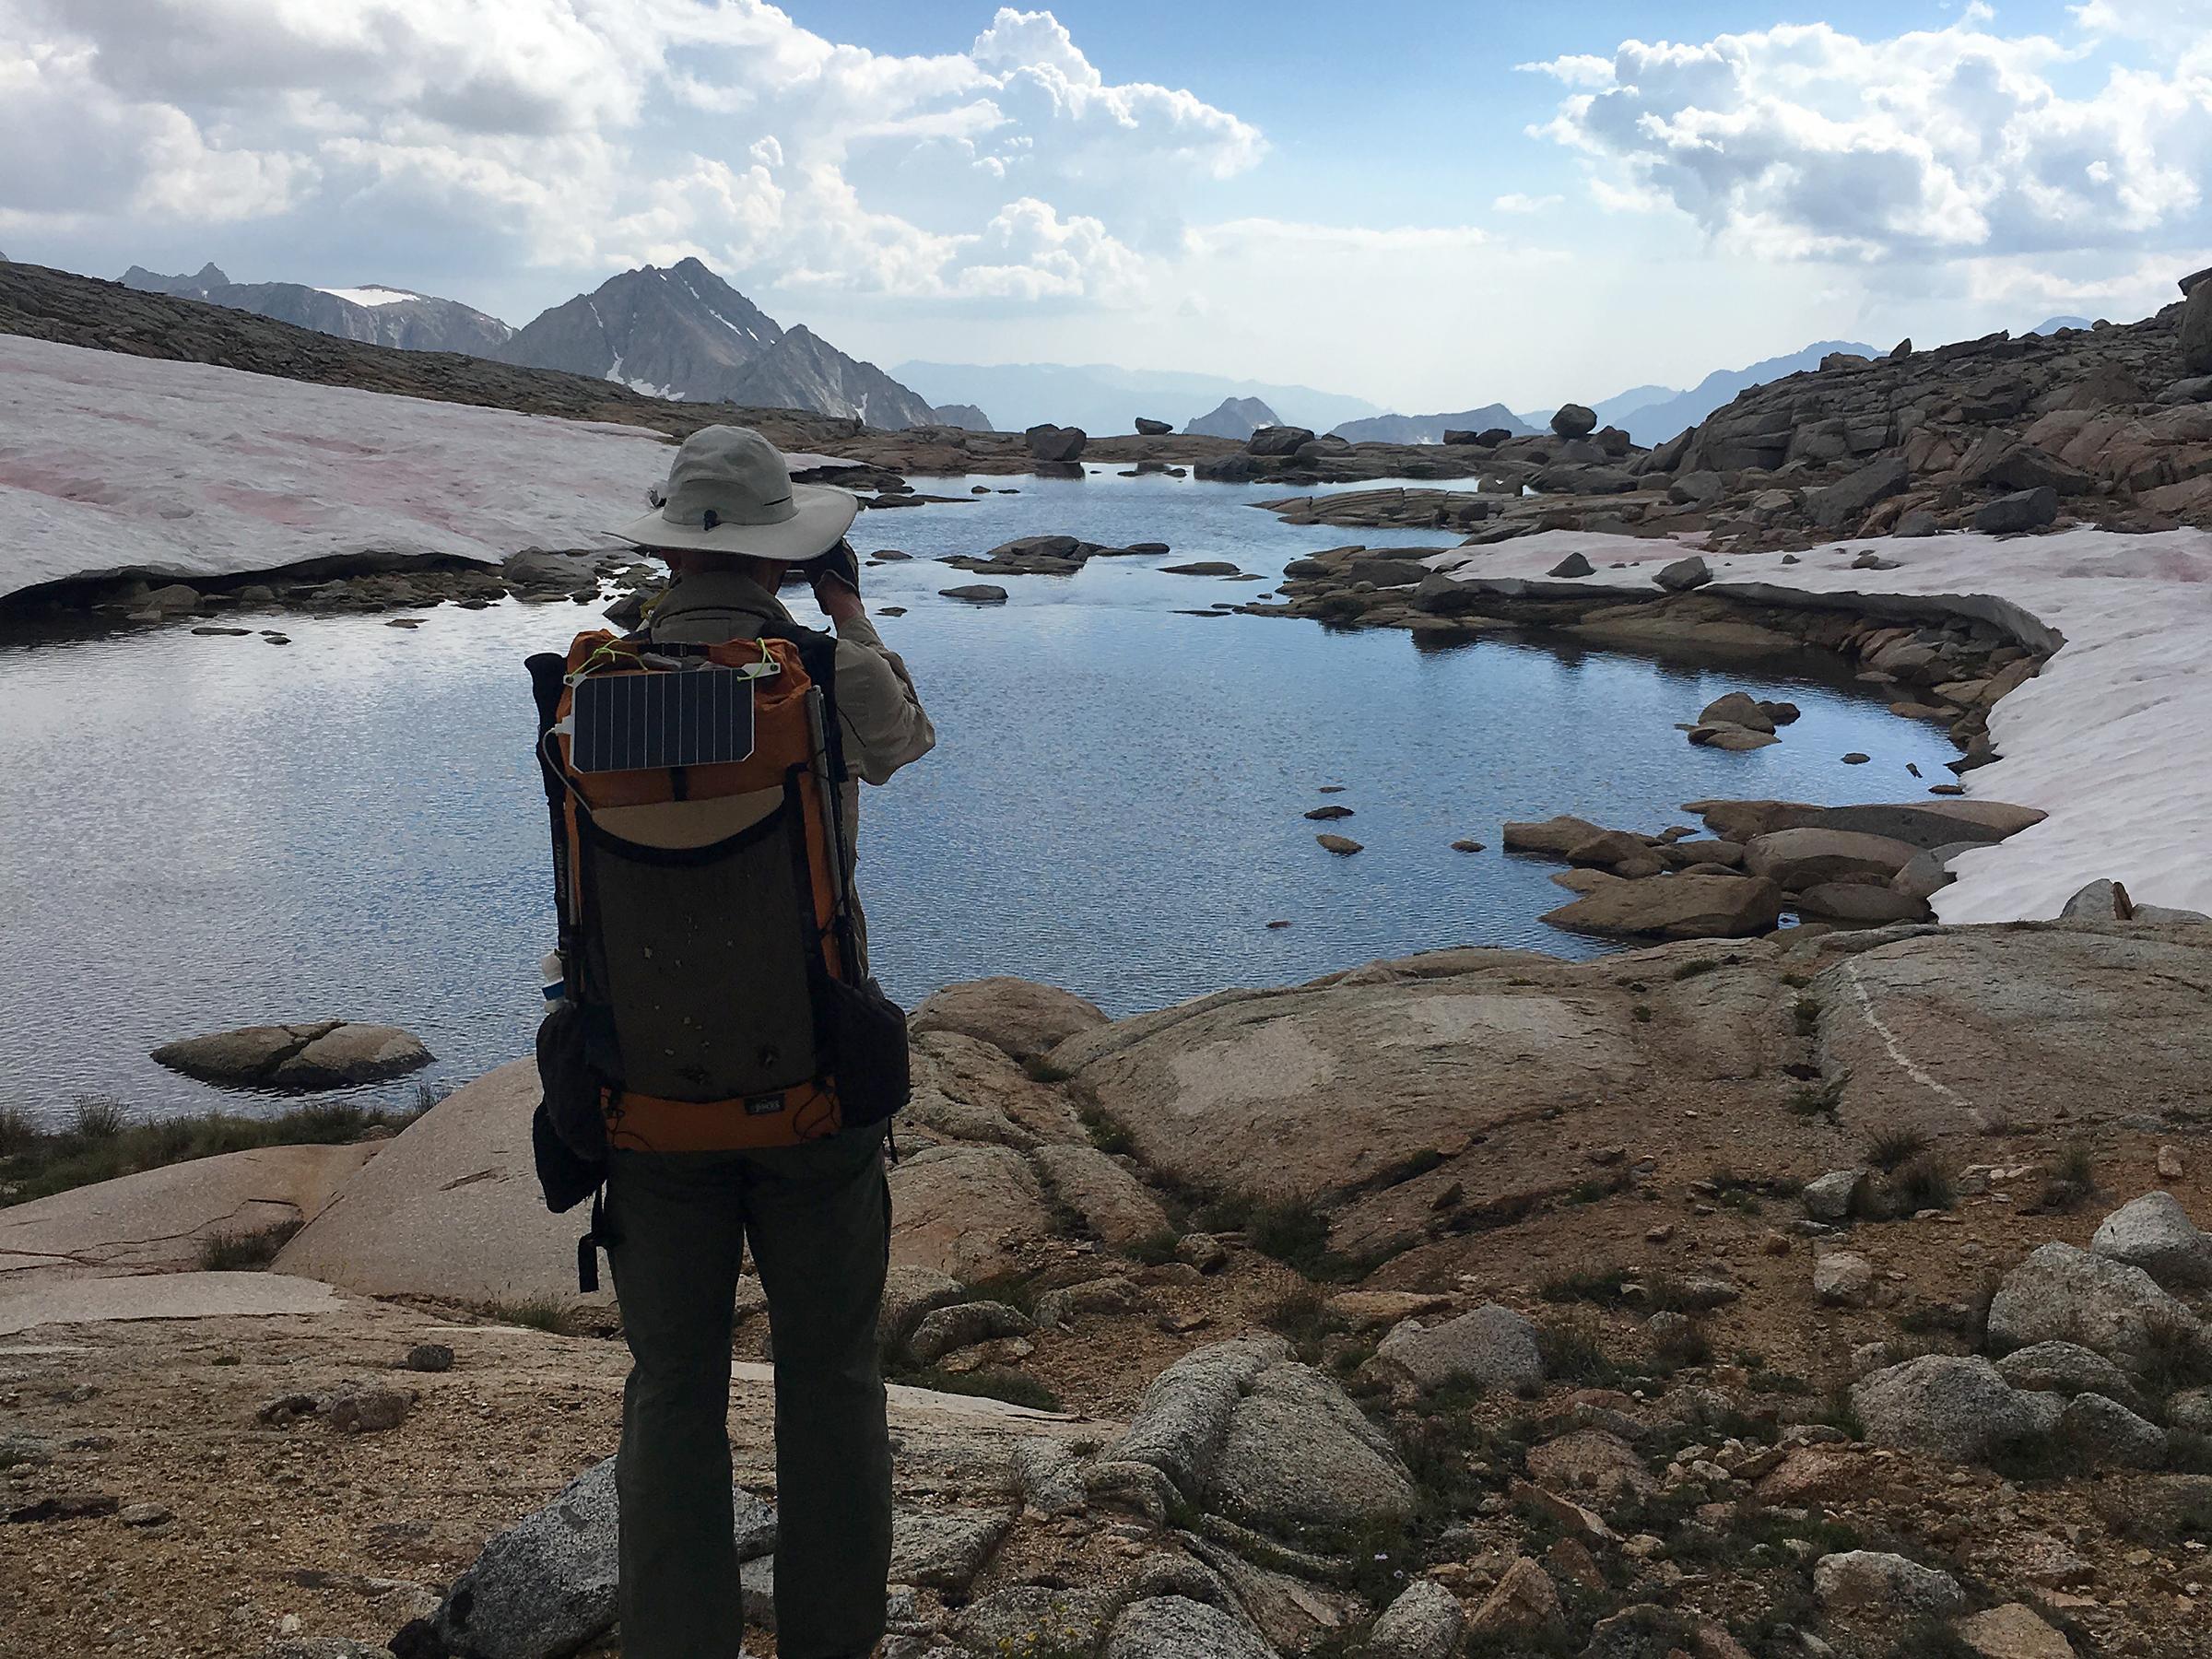 trailname-backstroke-sierra-high-route-2017_1017.jpg